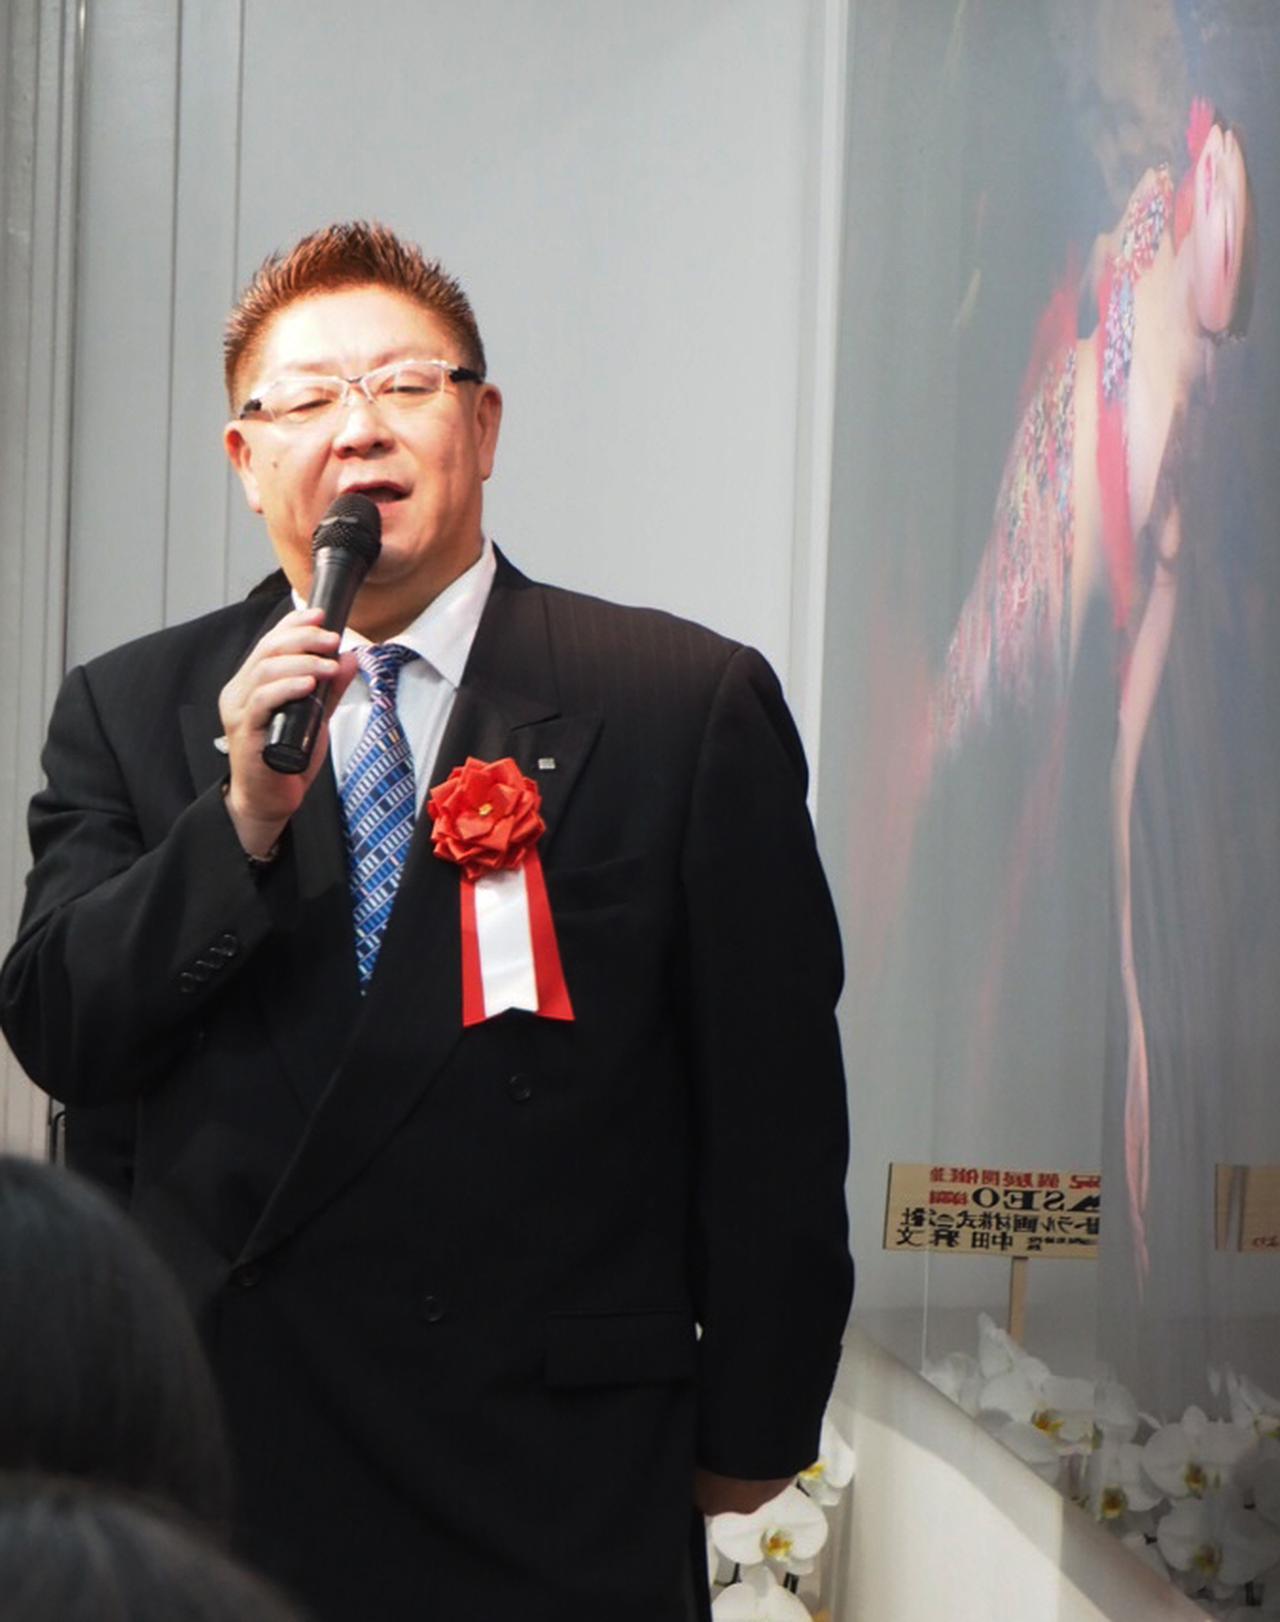 画像1: frameman.co.jp